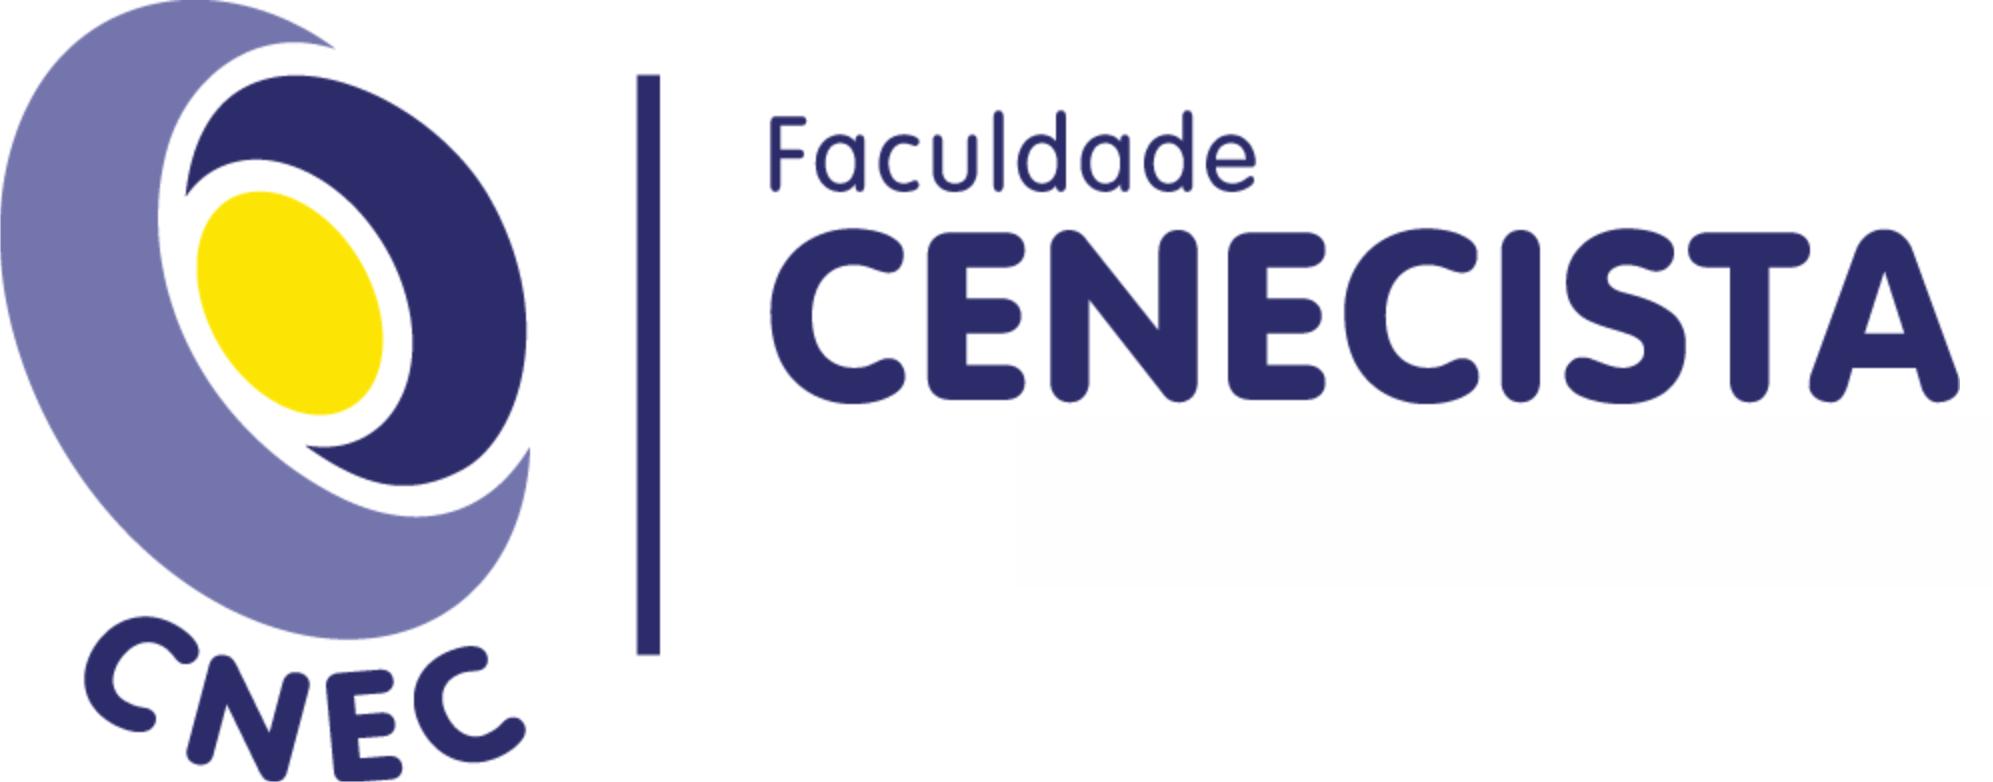 FACULDADE CENEC